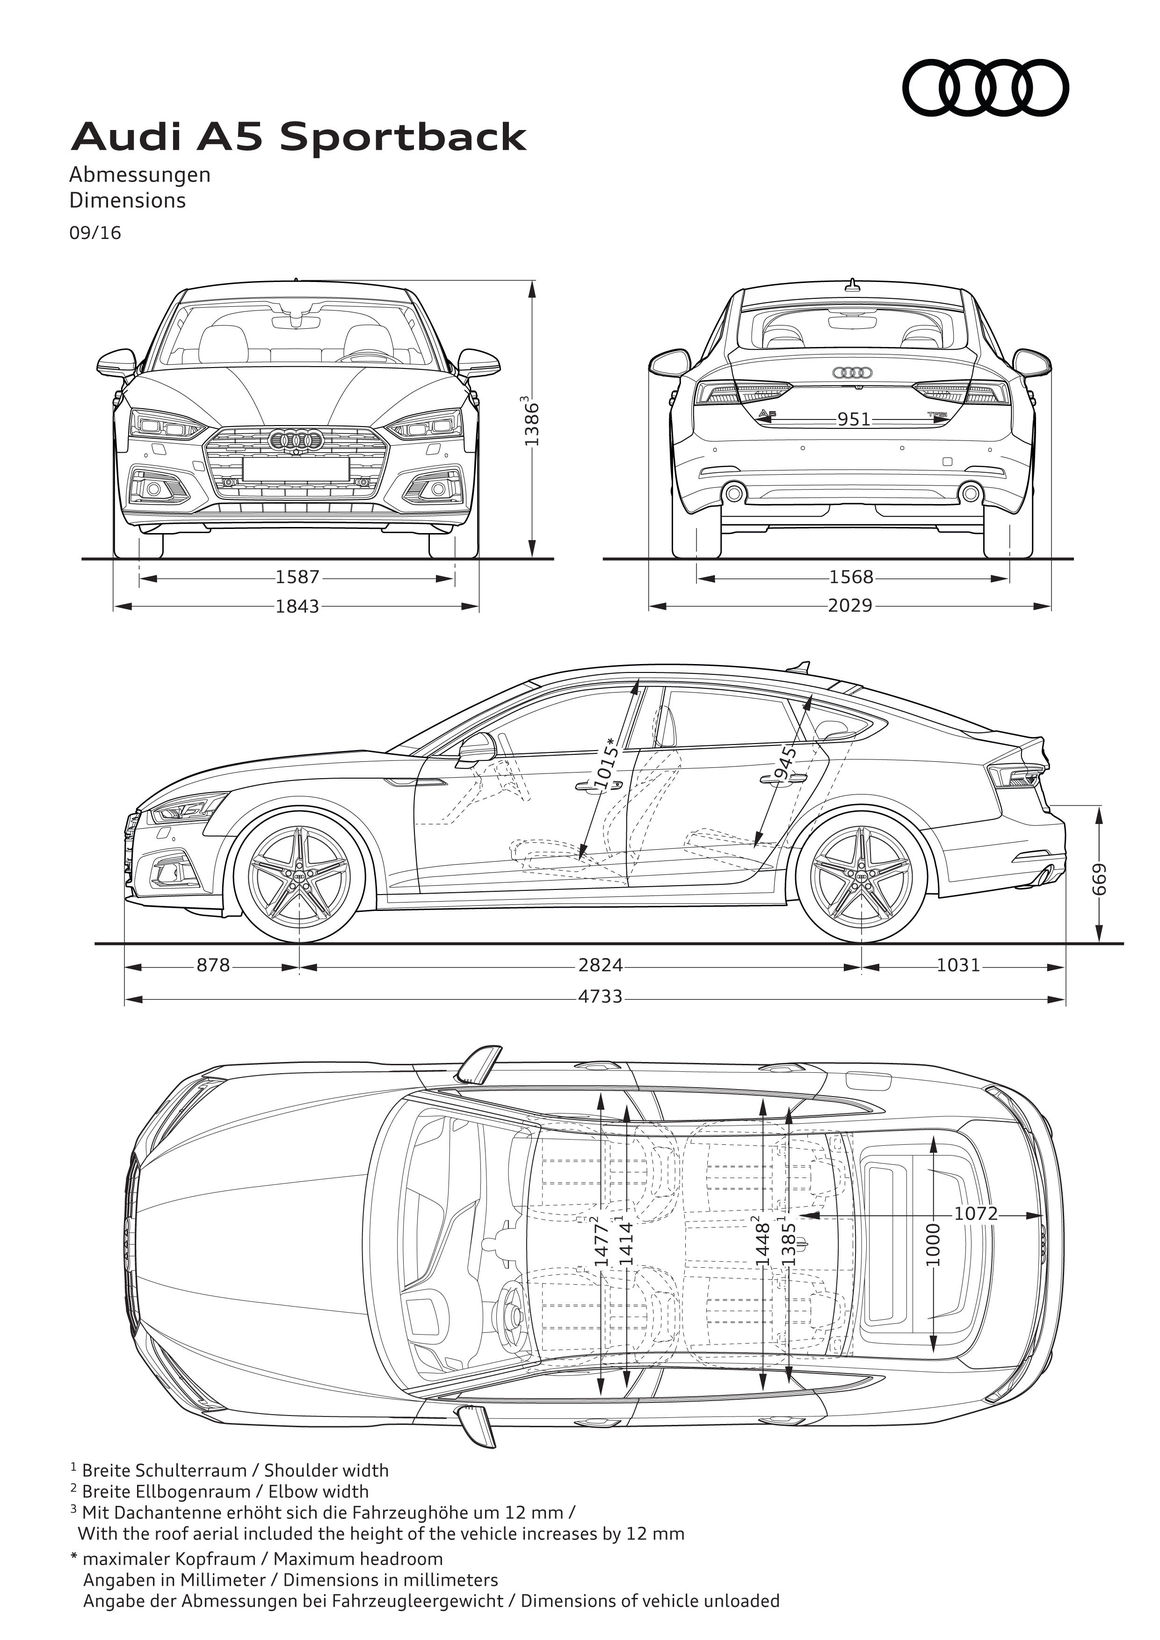 Audi A5 Sportback Audi Mediacenter